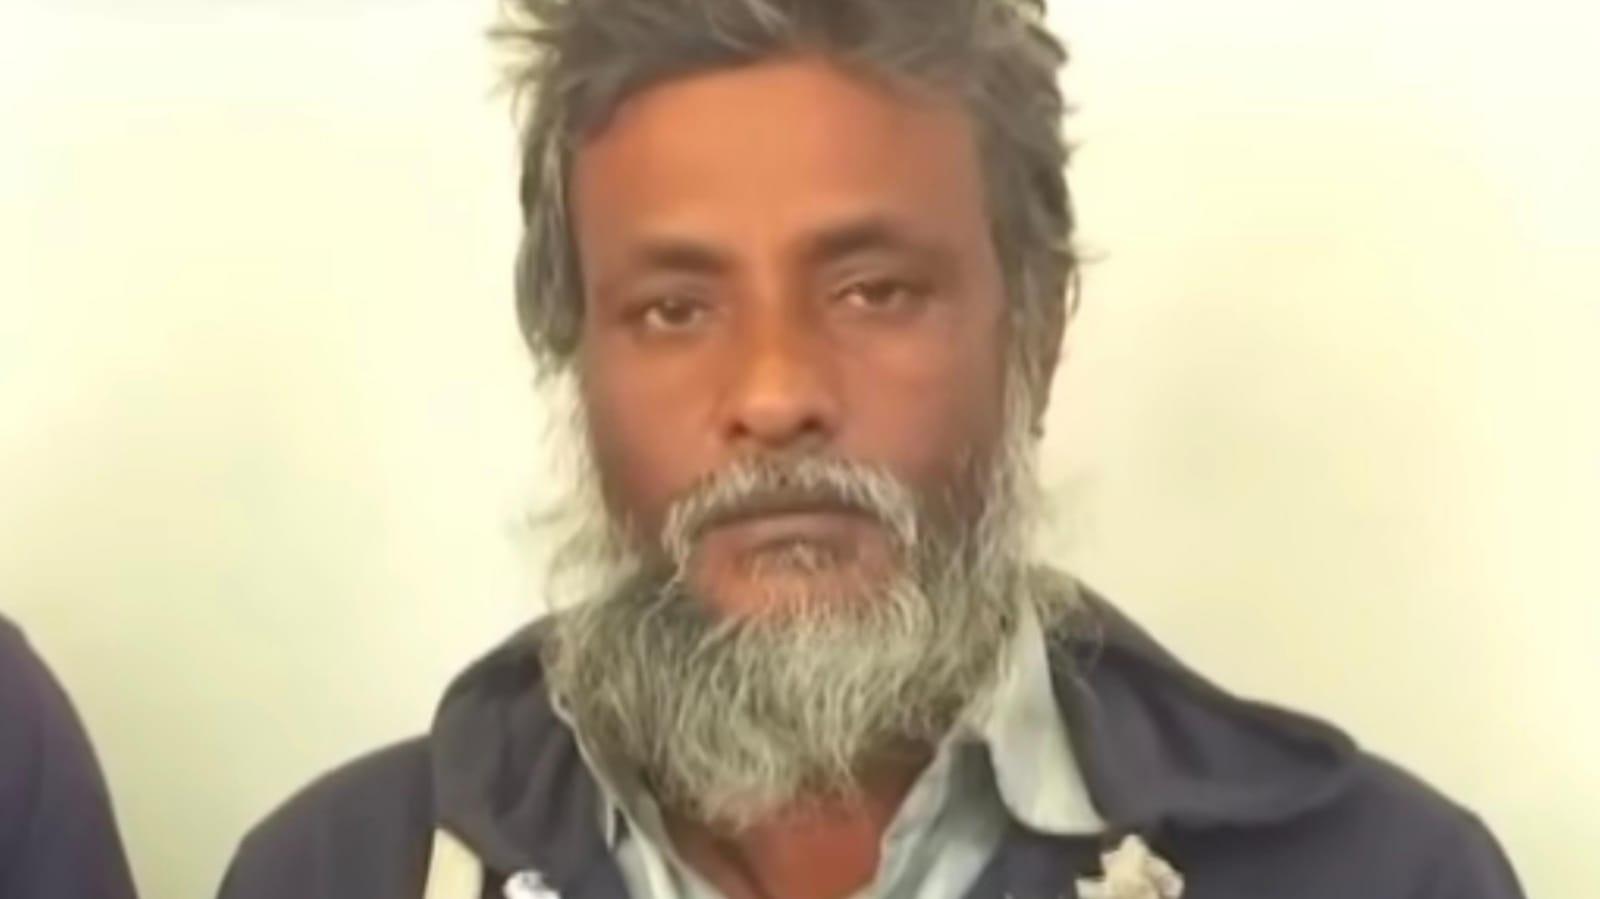 Ankleshwar Suitecase Murder mystery Ajom Sheikh Bangladesh